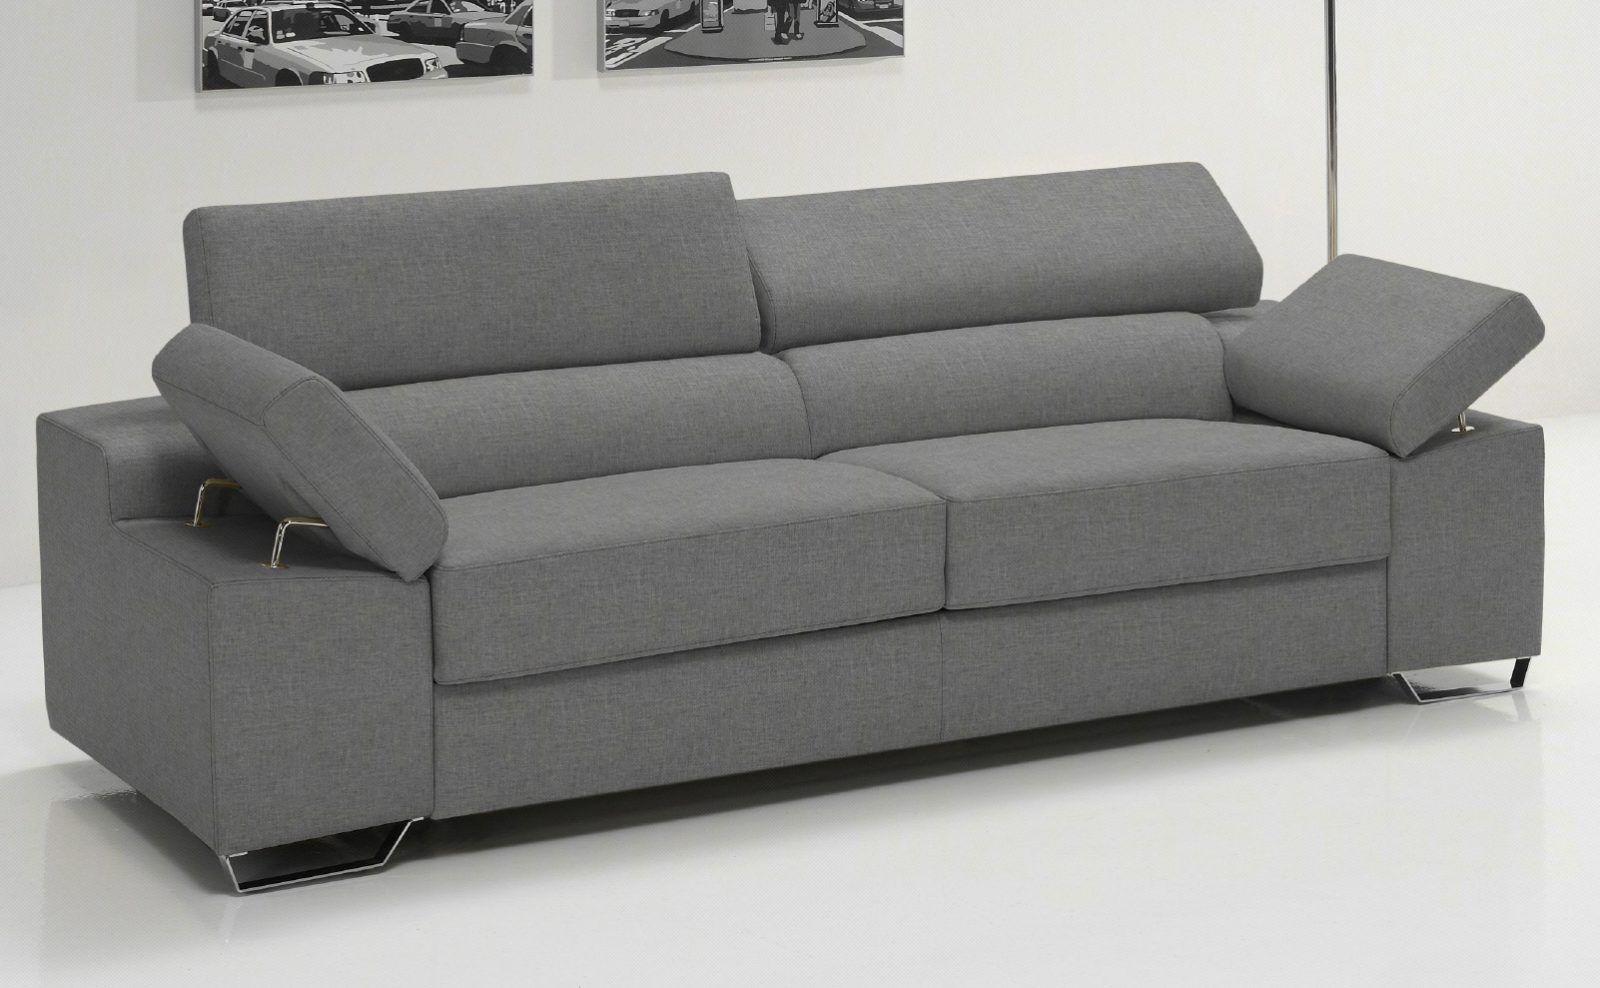 Sof cama estilo italiano muebles sofa y madrid - Sofa cama madrid ...